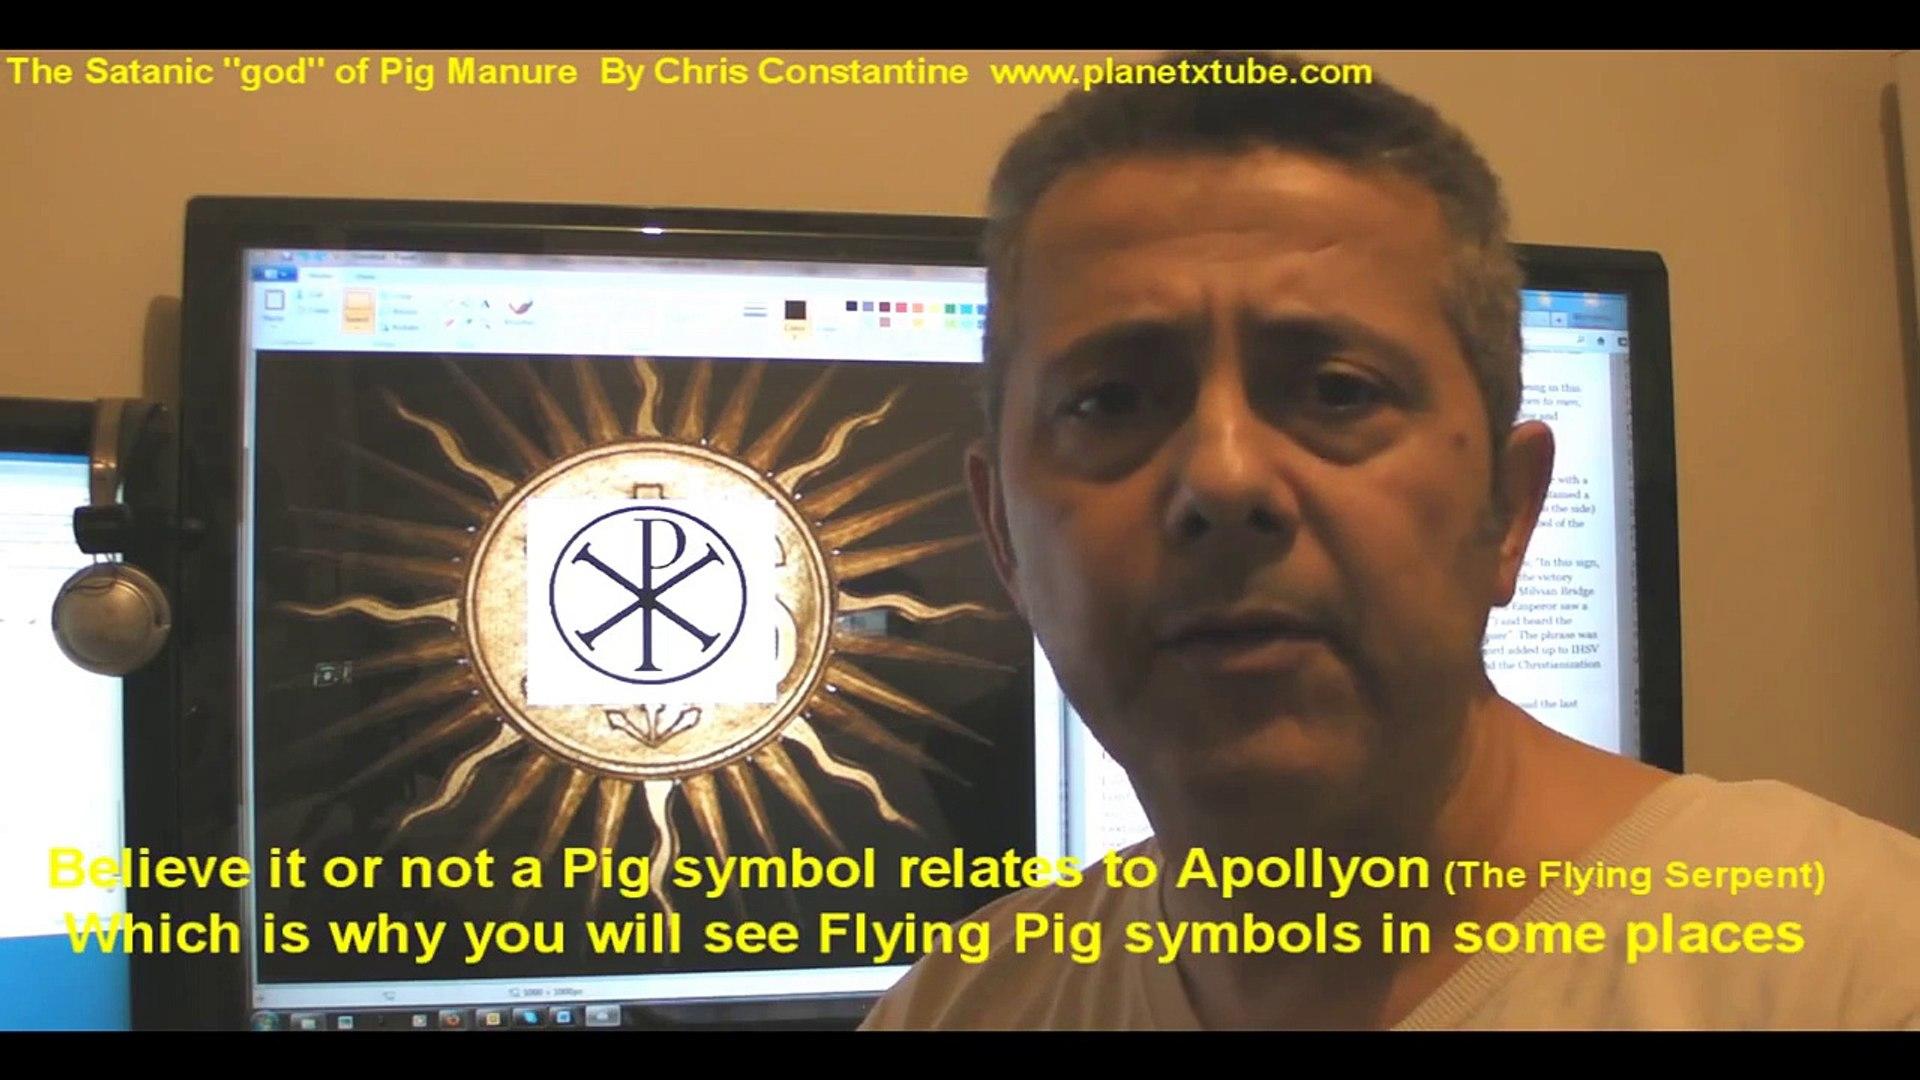 Satanic Religious Symbols in Christian Churches